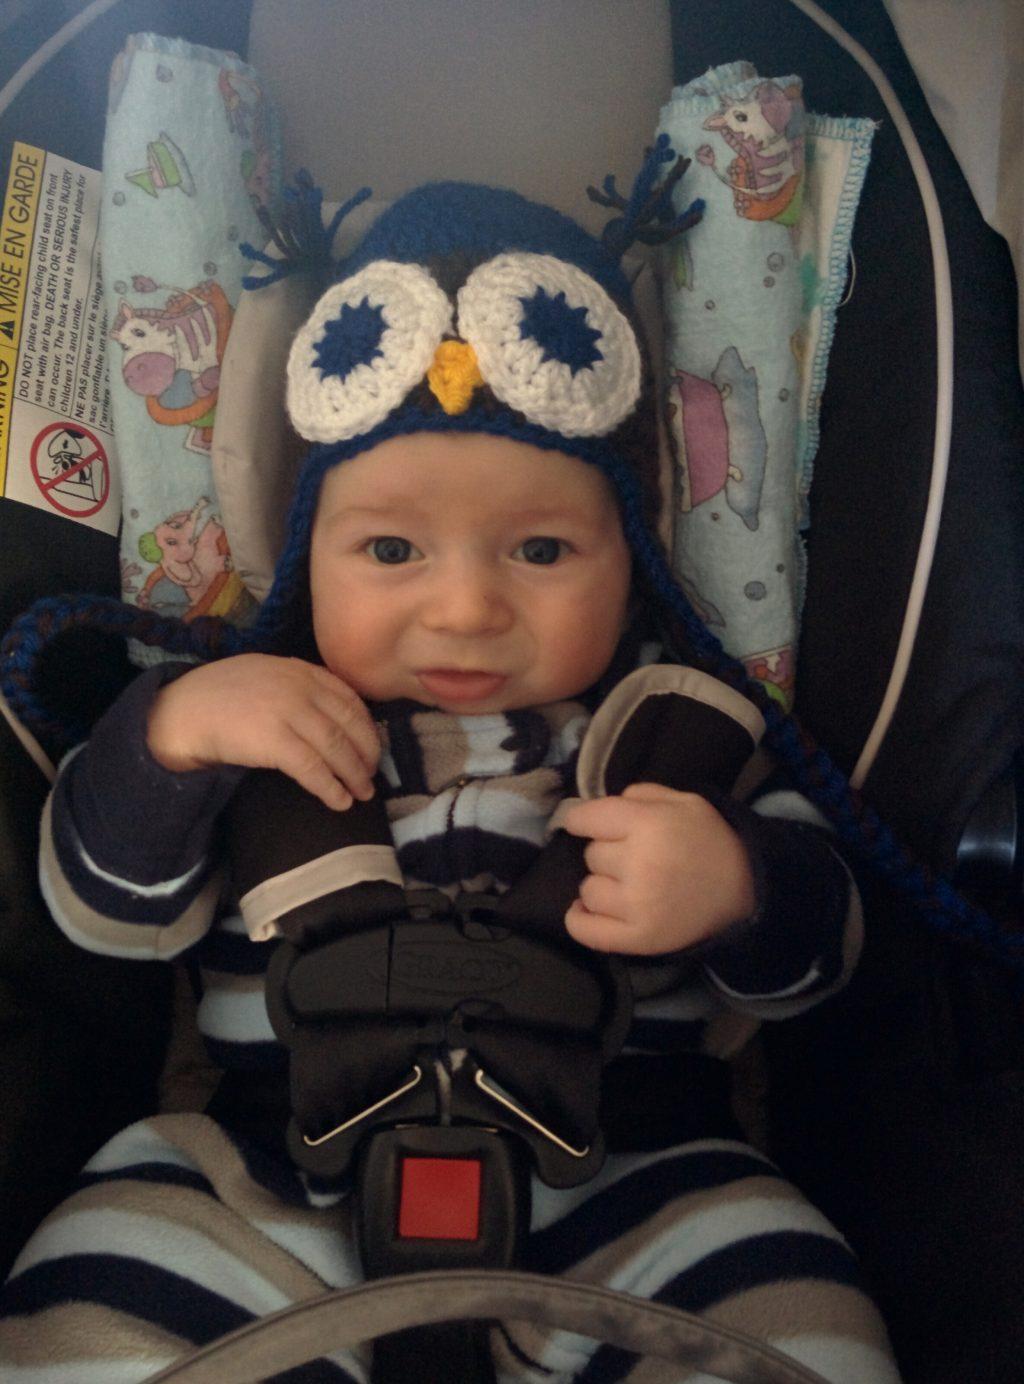 Brody Huber – 3 month update